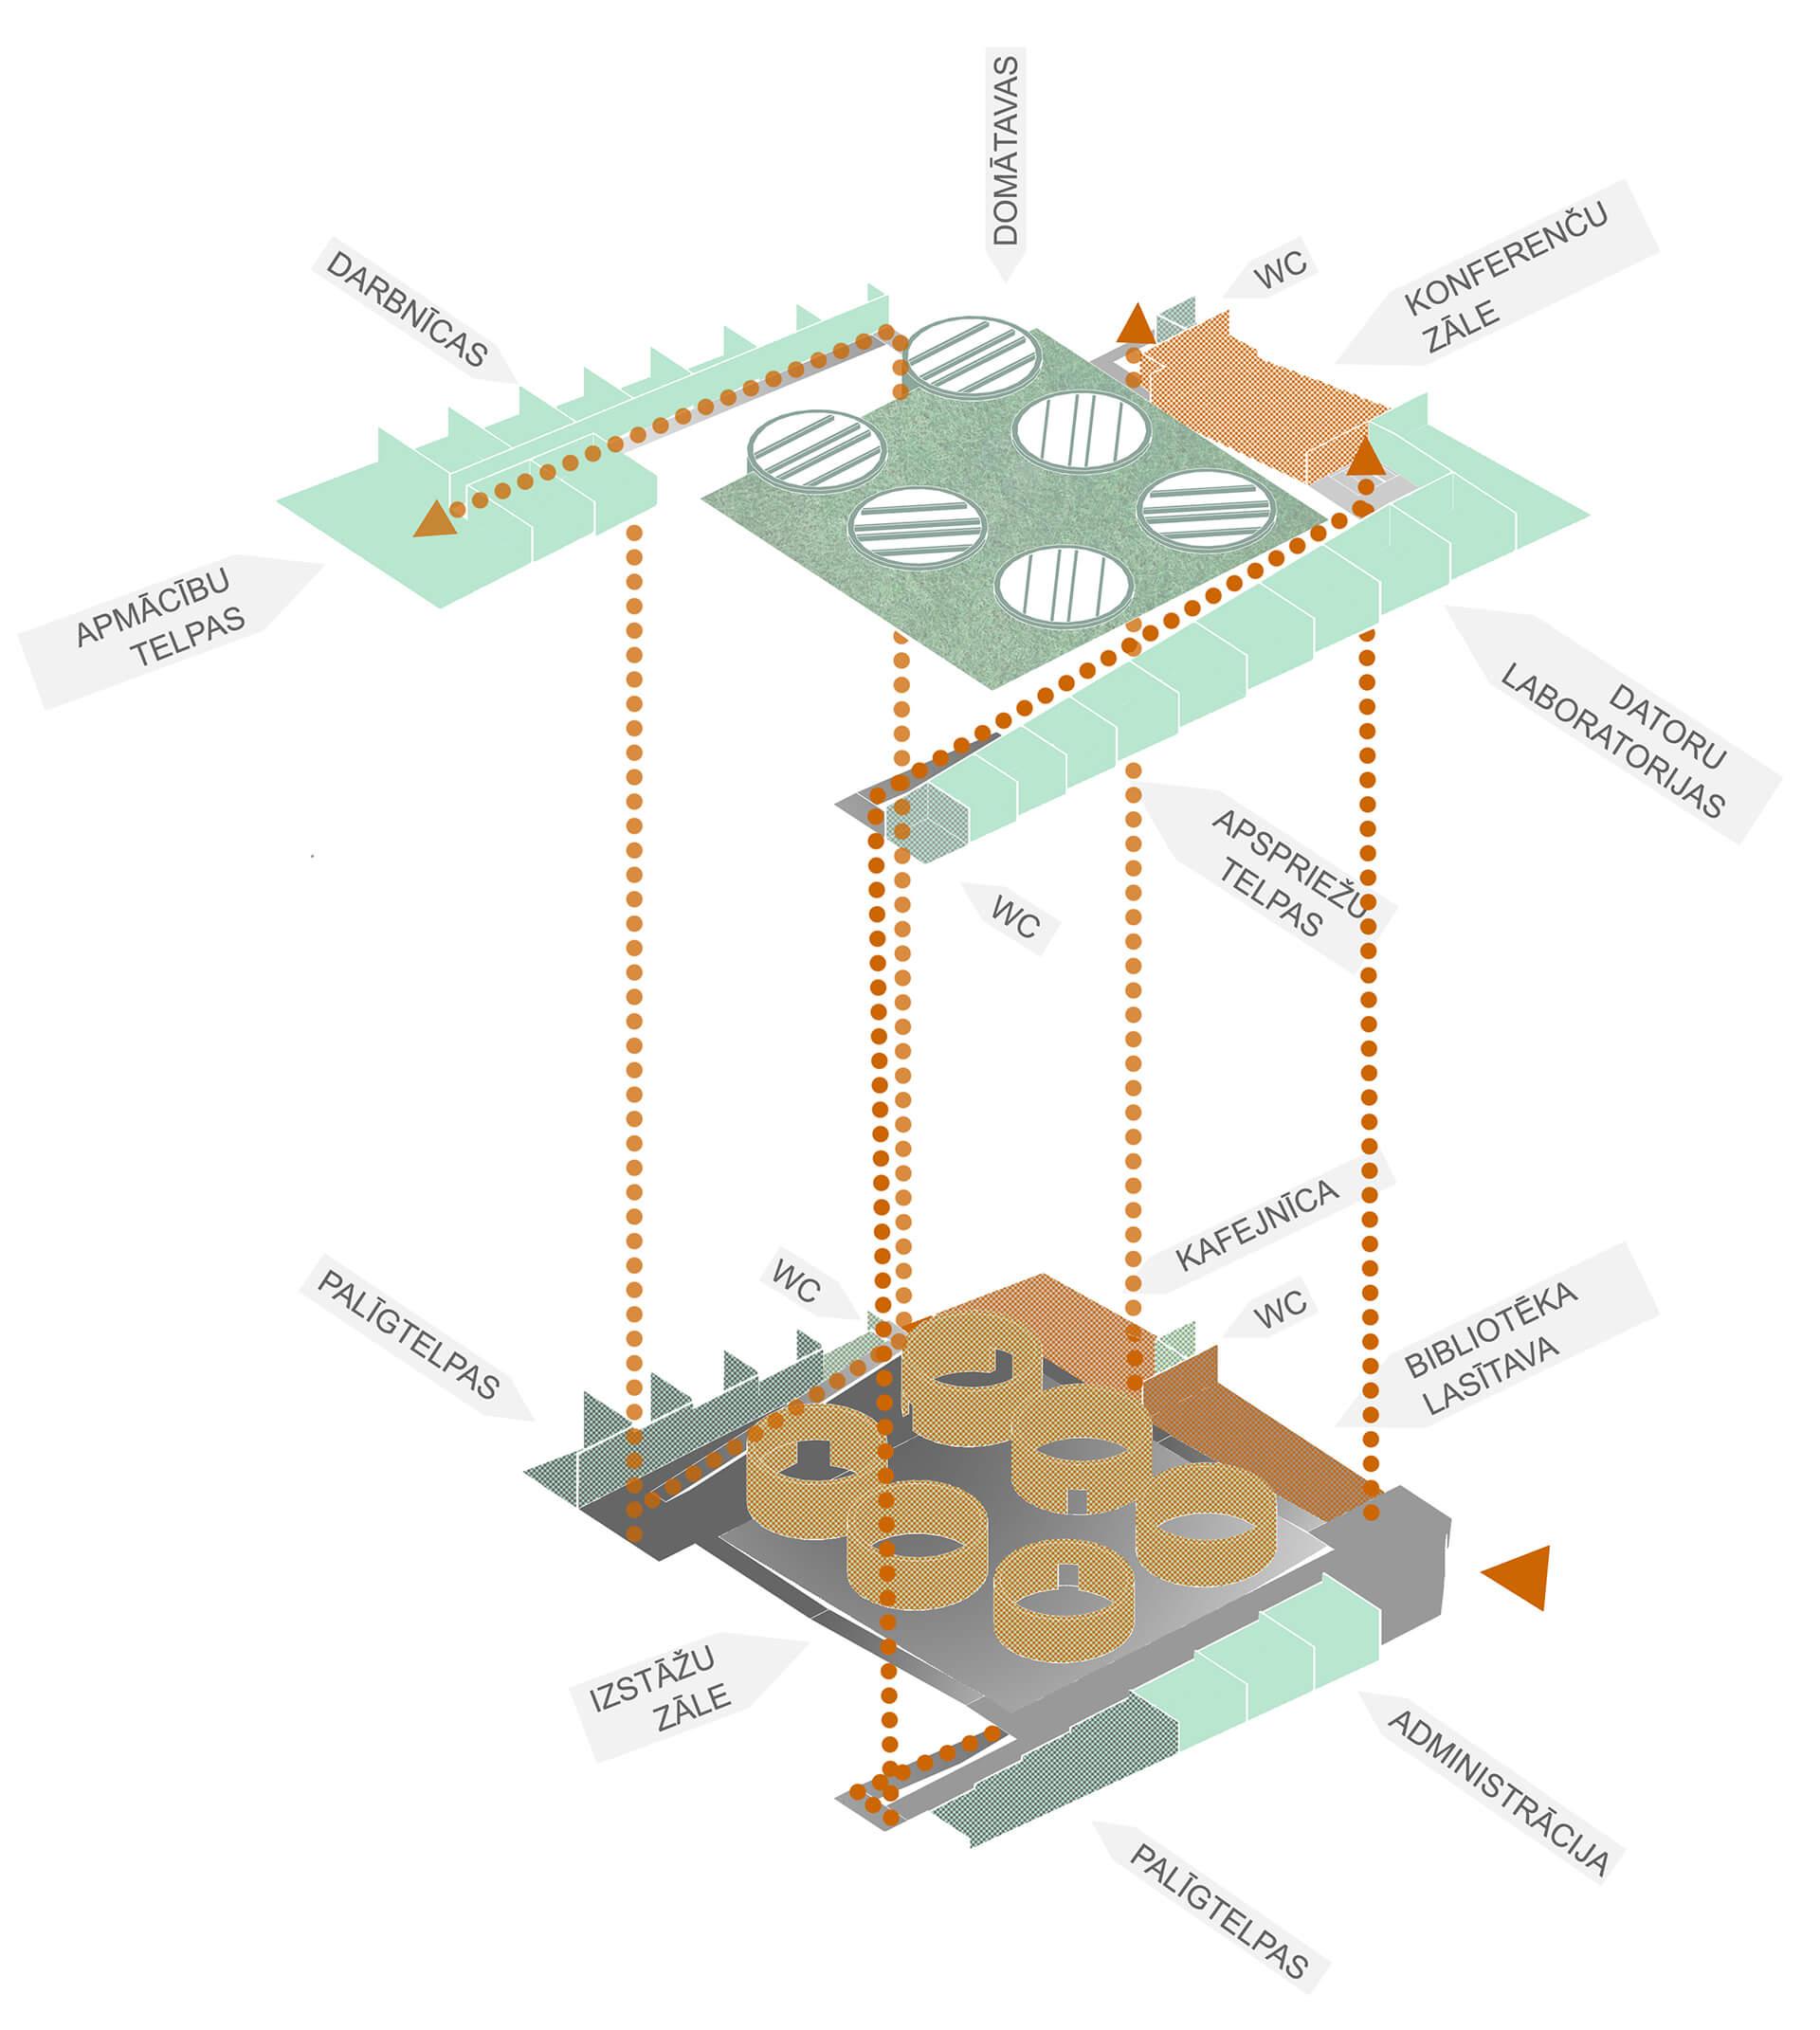 https://laagaarchitects.lv/wp-content/uploads/2019/11/04-01-21-Paliene.jpg